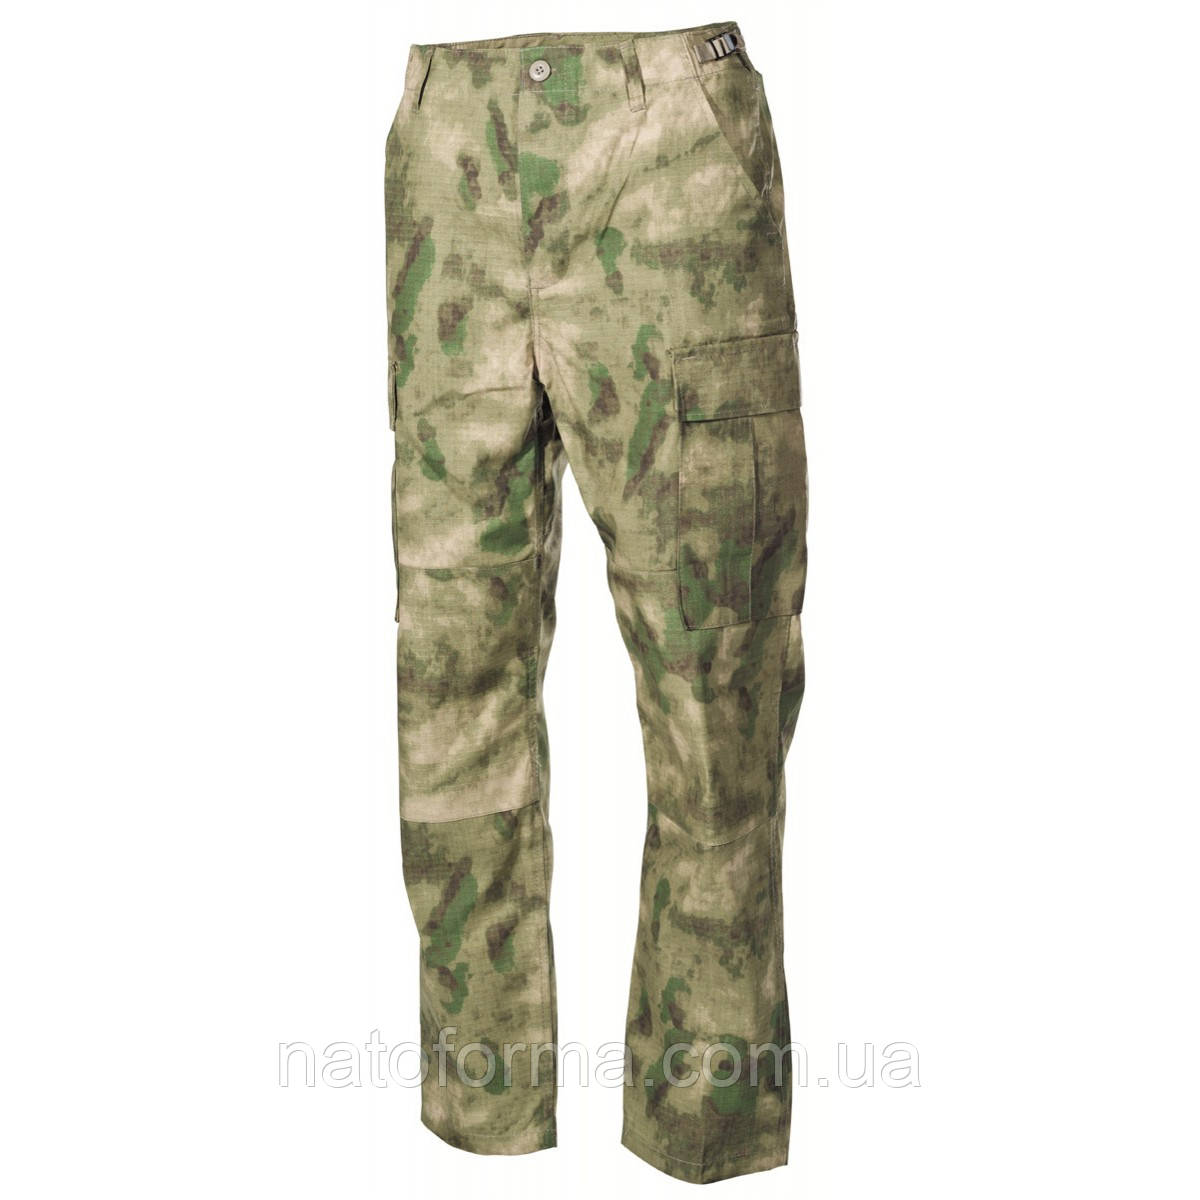 Штаны, брюки A-Tacs FG, Rip-Stop, МFH